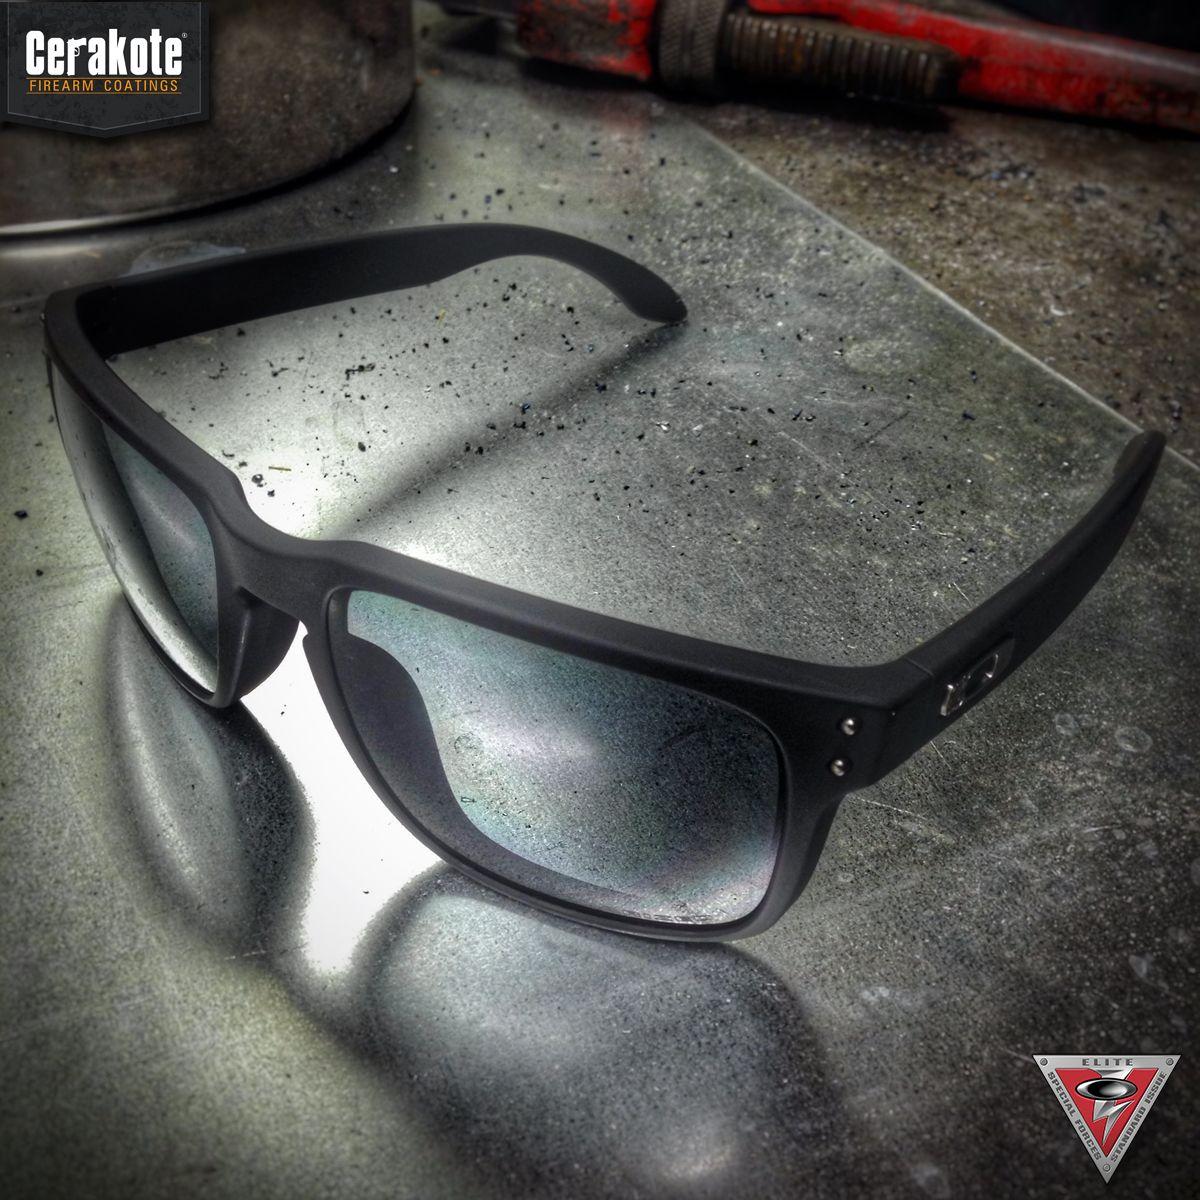 5a2a8ead3cf07 Oakley Standard Issue Holbrook sunglasses featuring Cerakote Graphite Black.